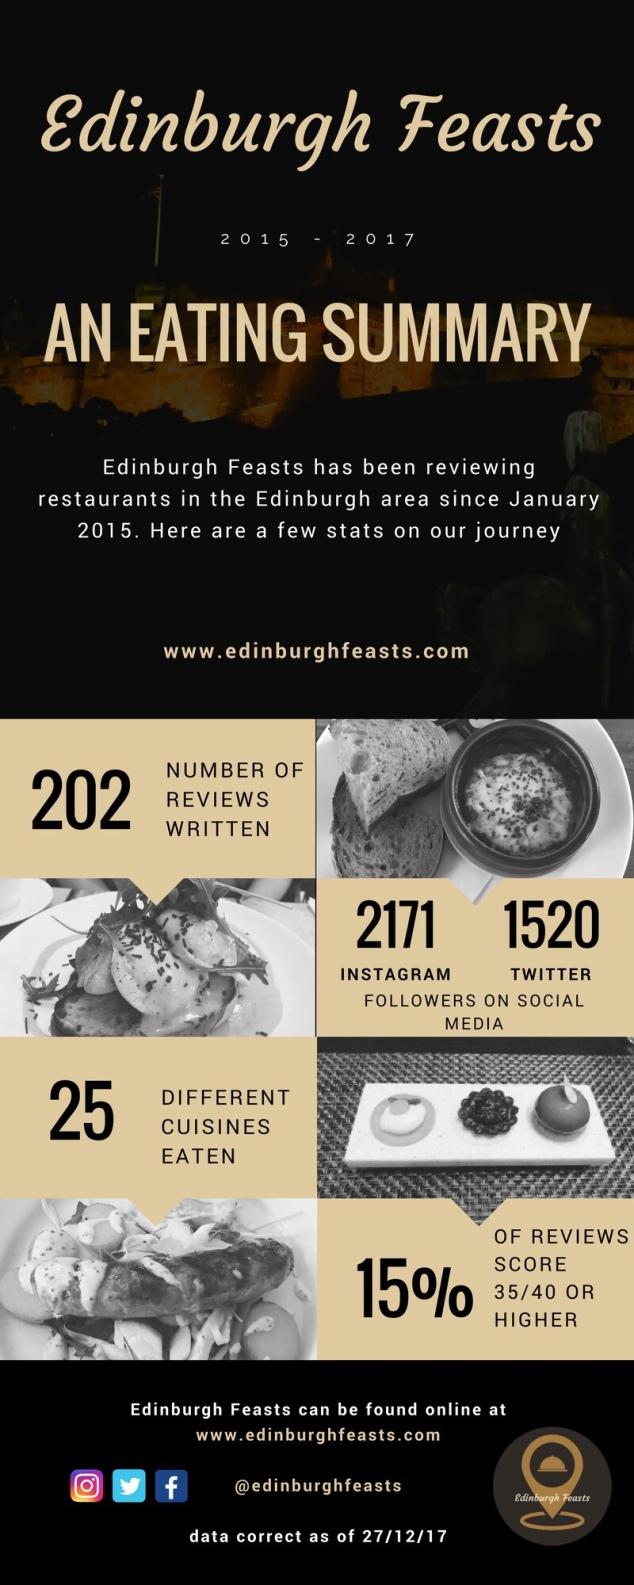 Edinburgh Feasts Infographic 2015-2017